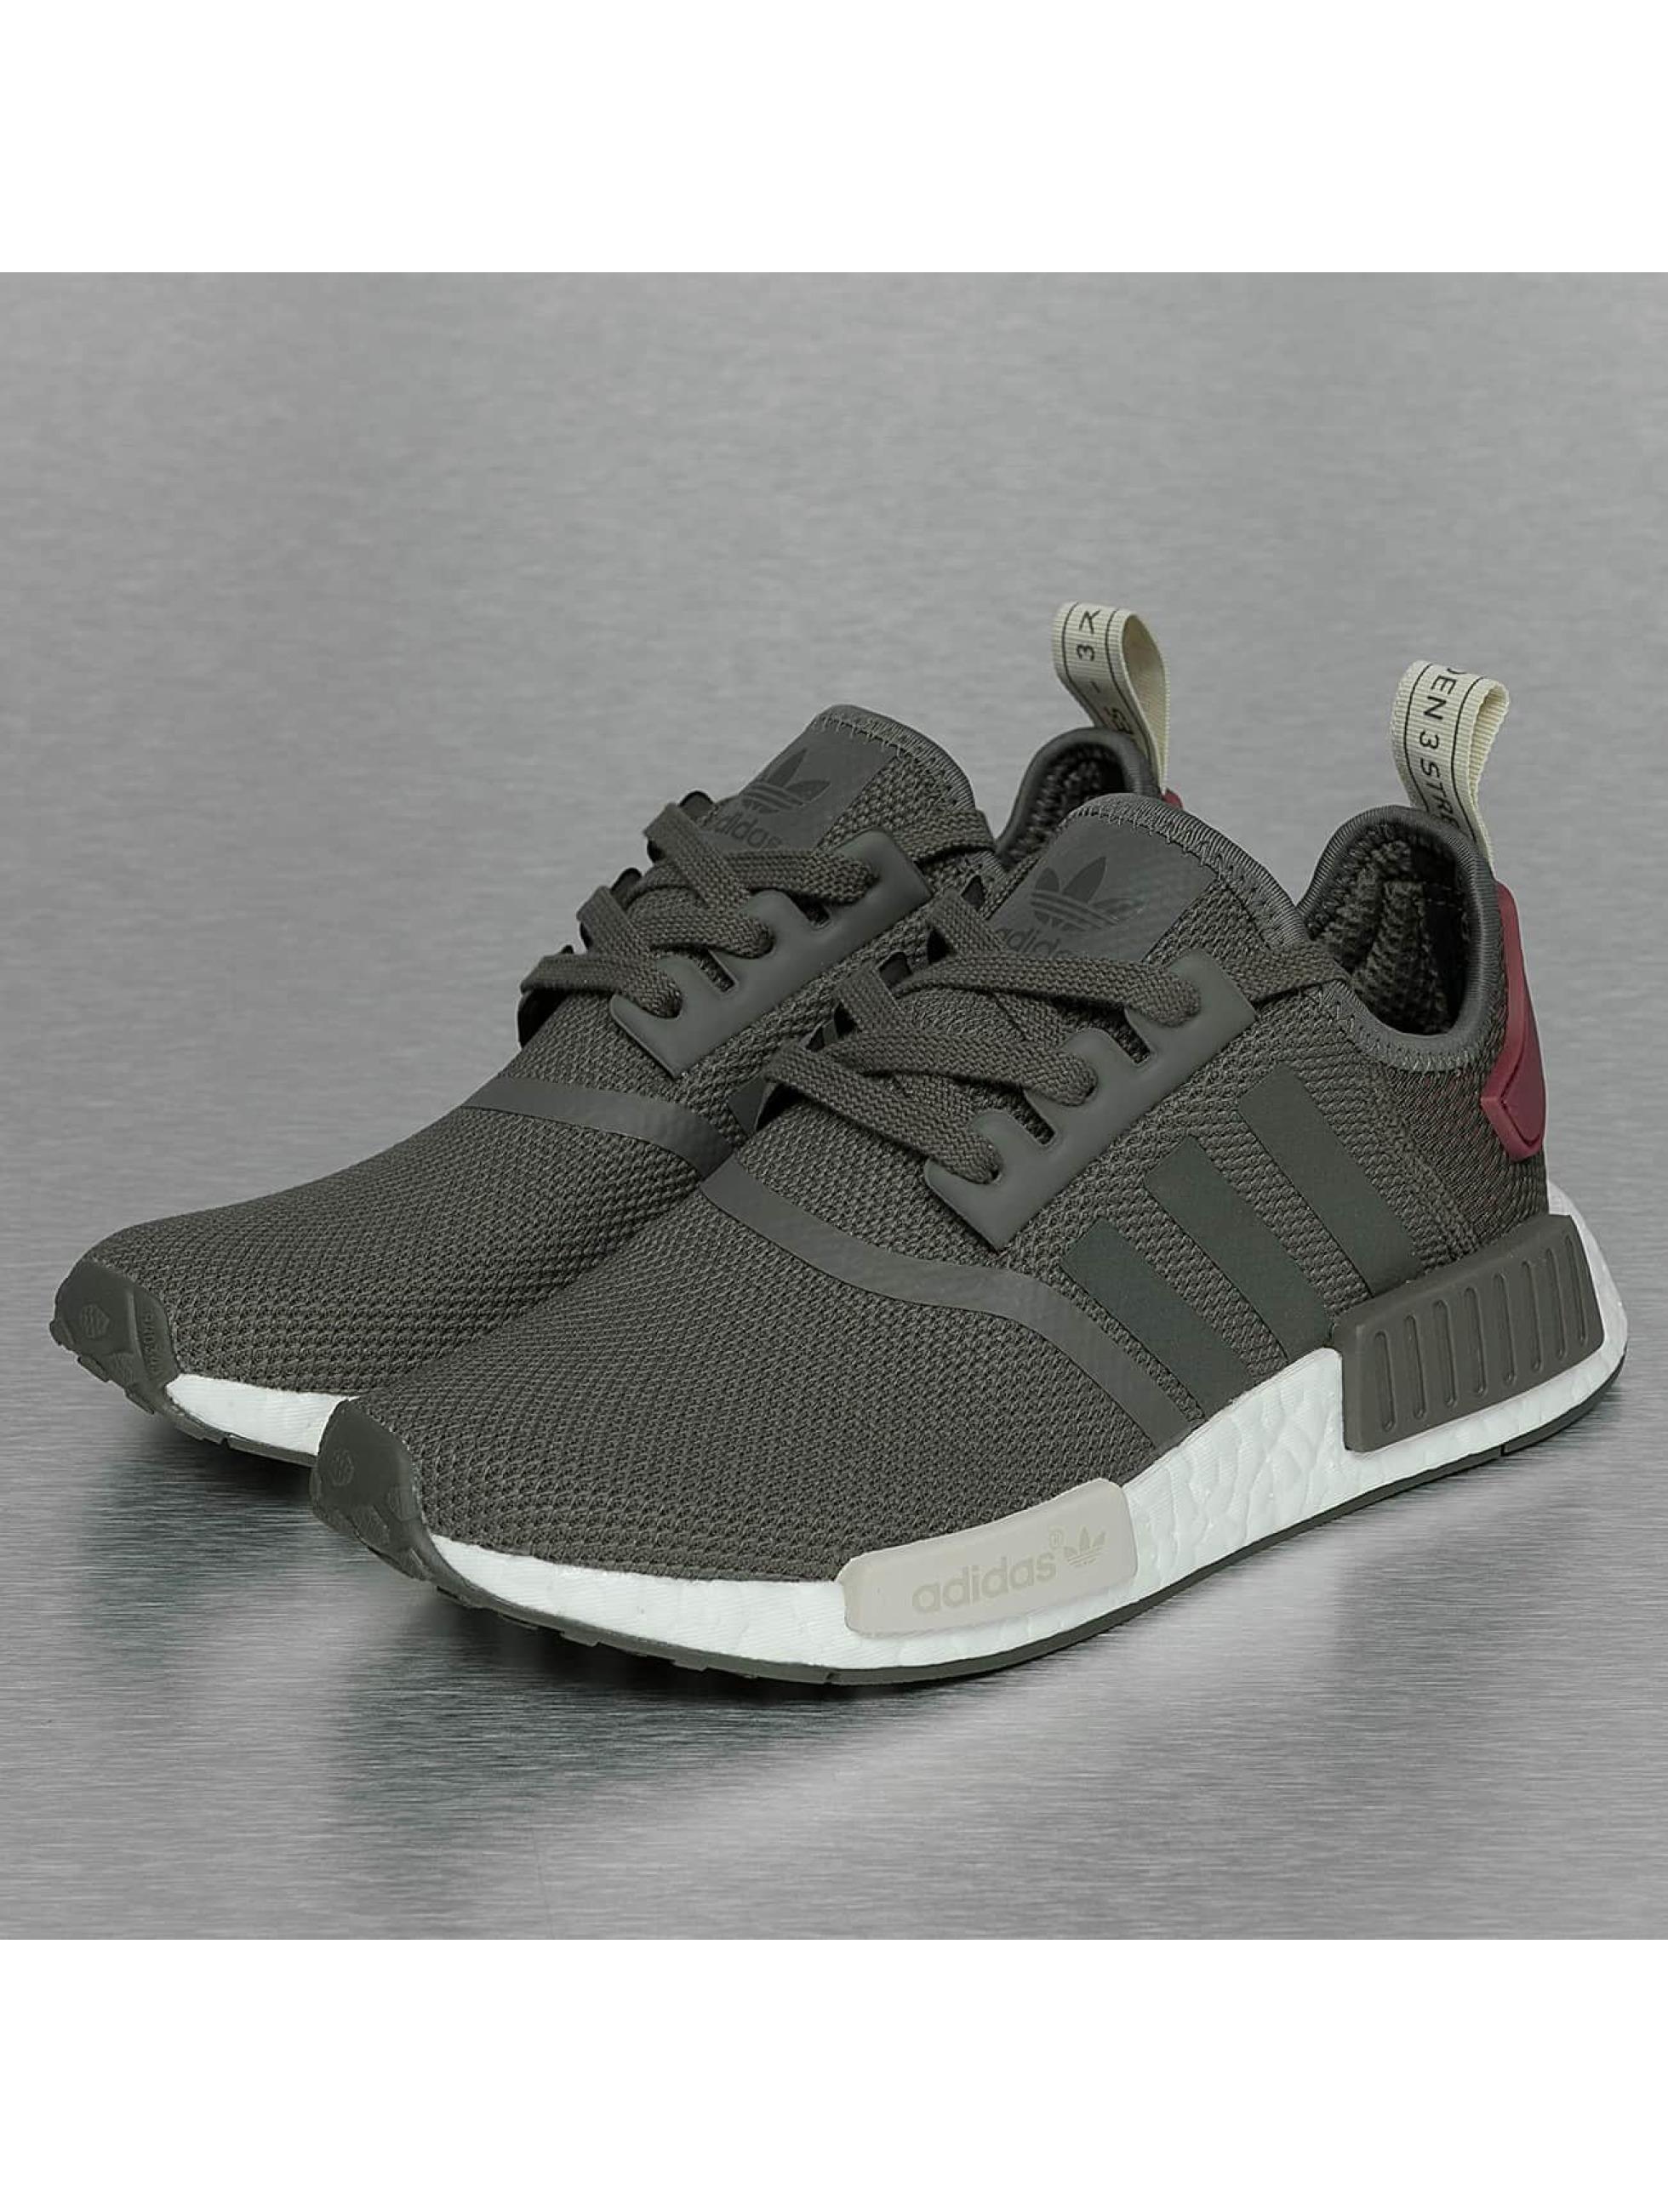 Adidas Schuhe Nmd R1 Grau